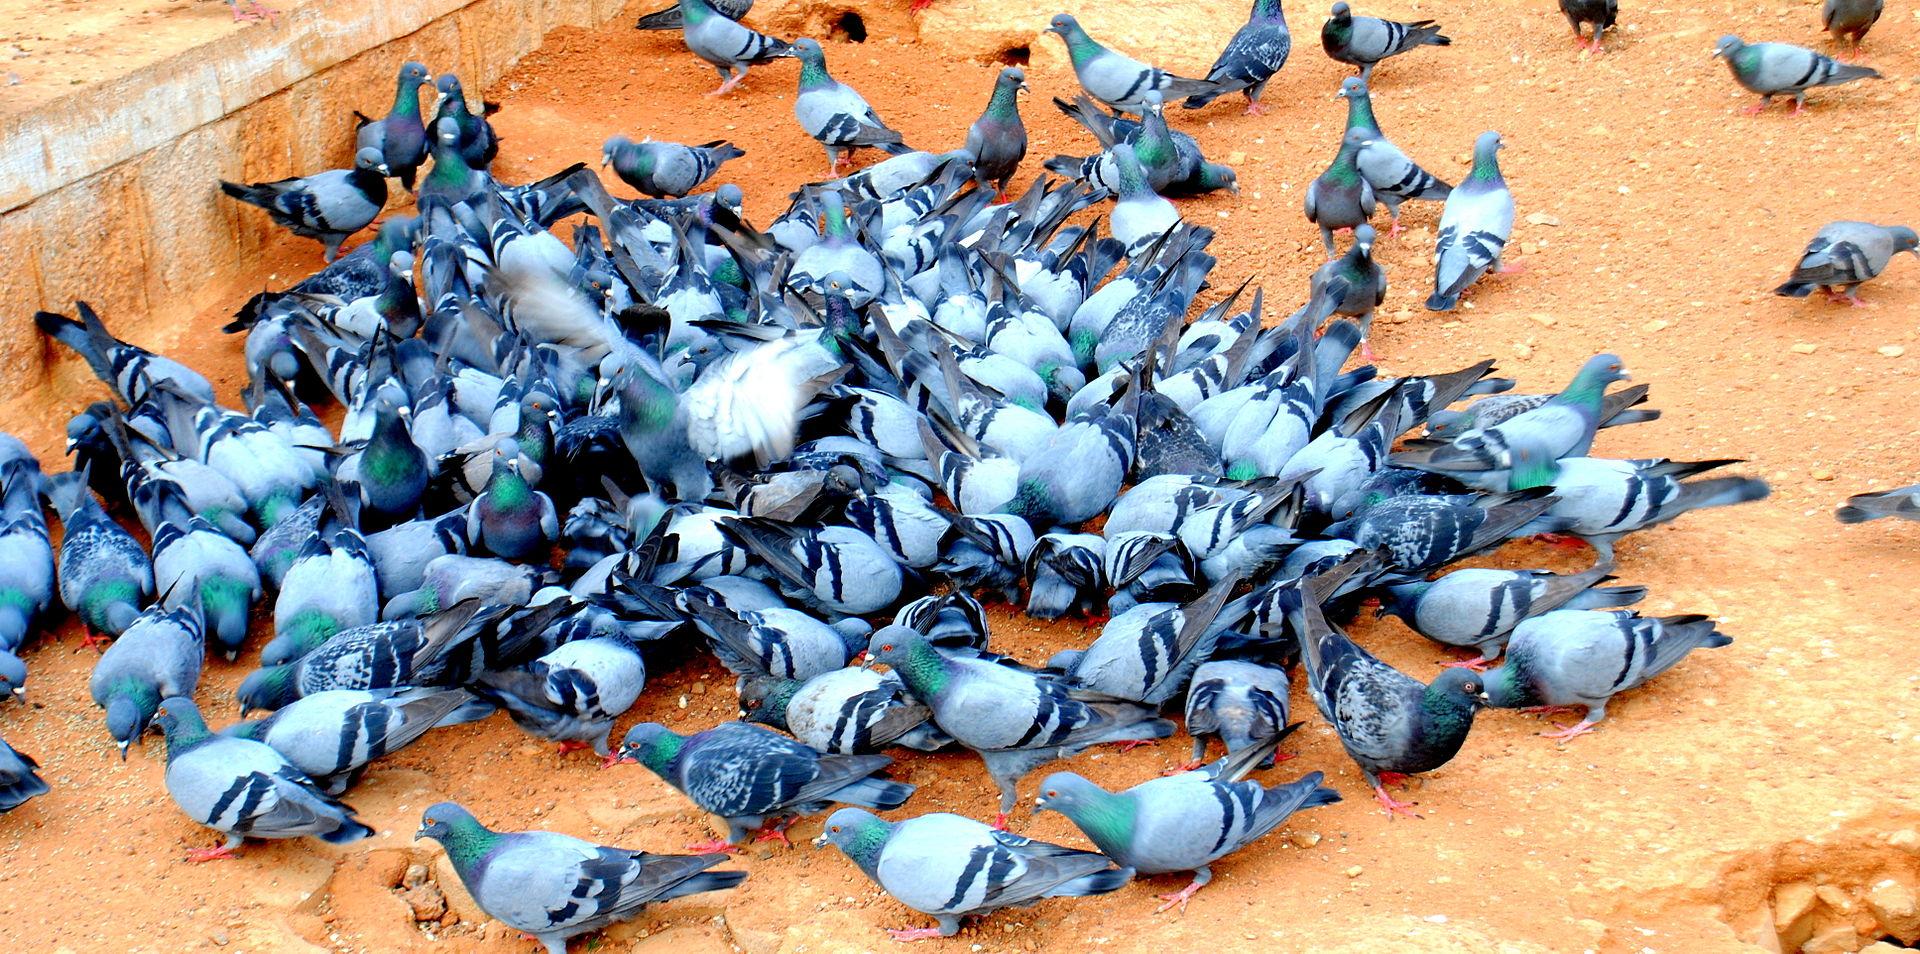 """100 Pigeons"" by Augustus Binu/ www.dreamsparrow.net/ facebook - Own work. Licensed under CC BY-SA 3.0 via Commons"